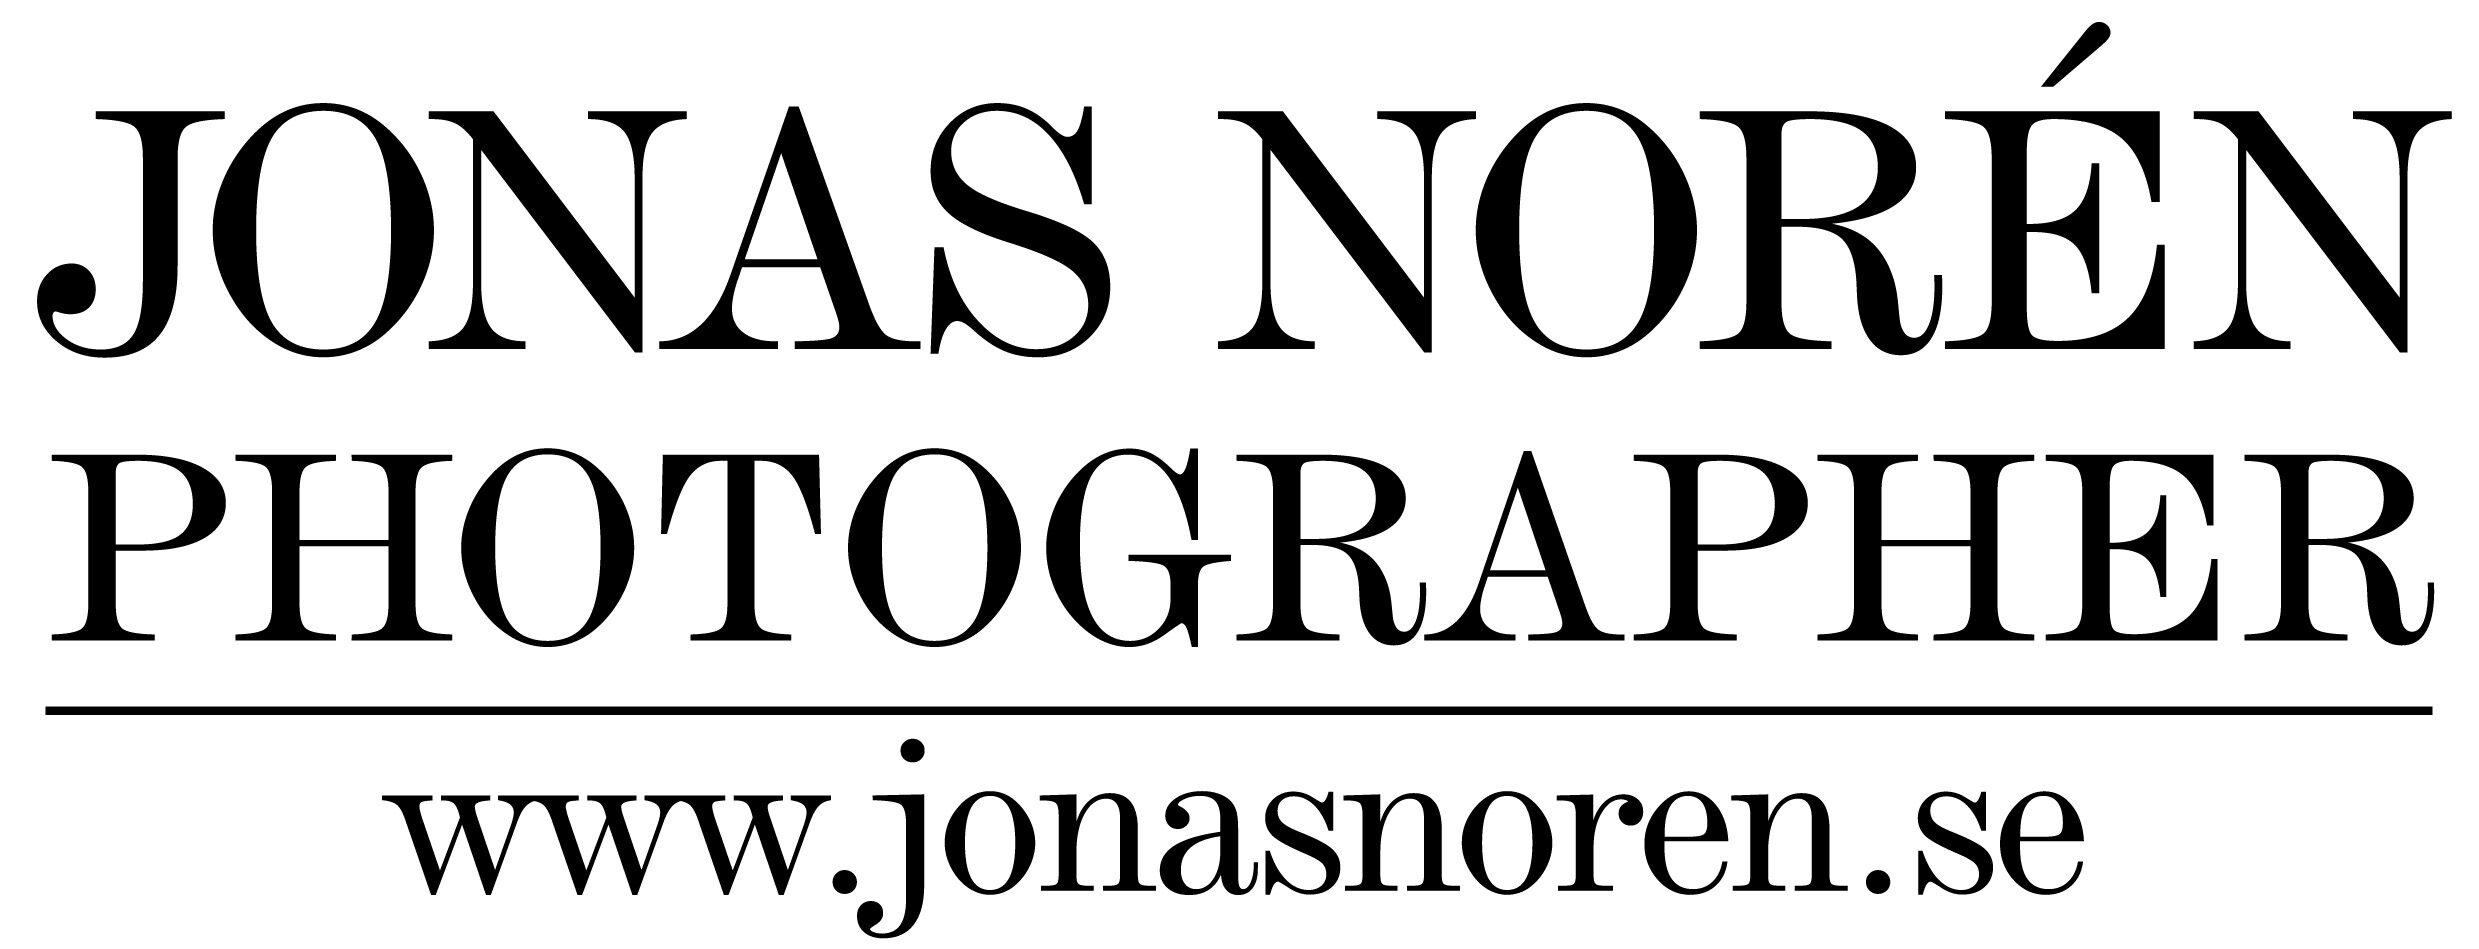 jonasnoren.se | The Store